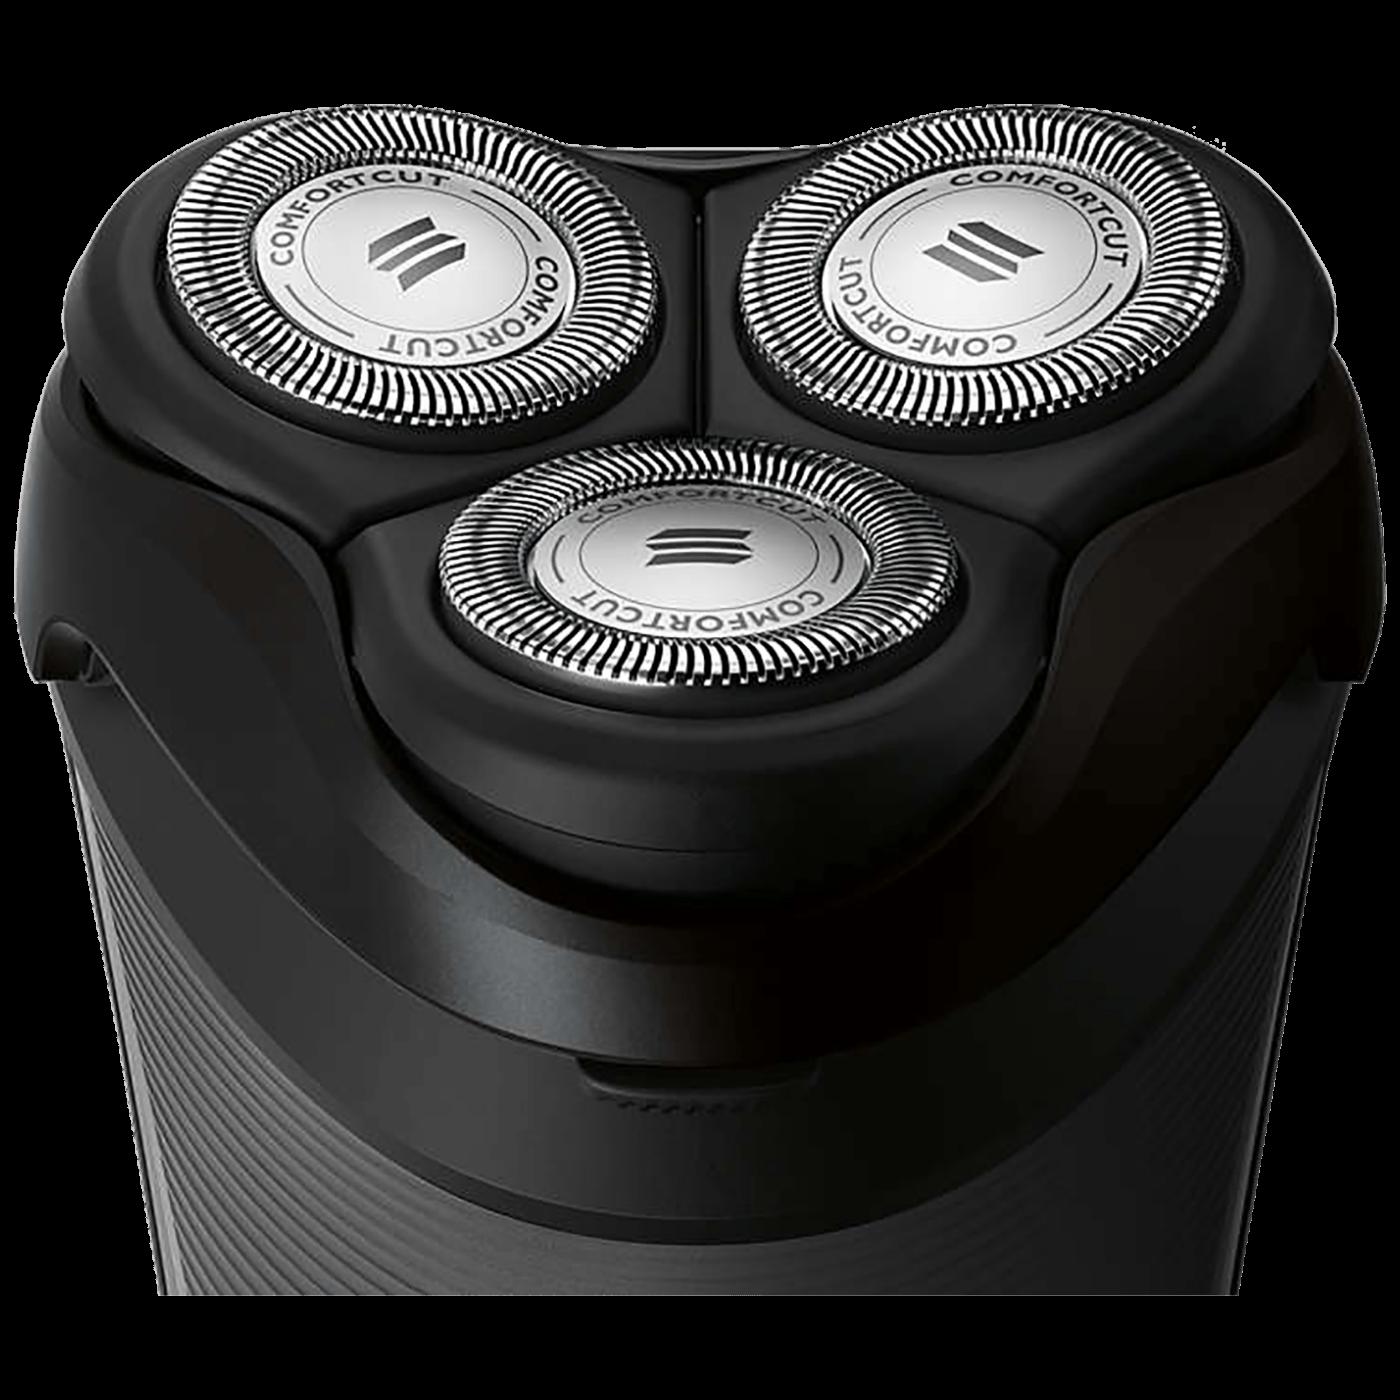 S3110/06